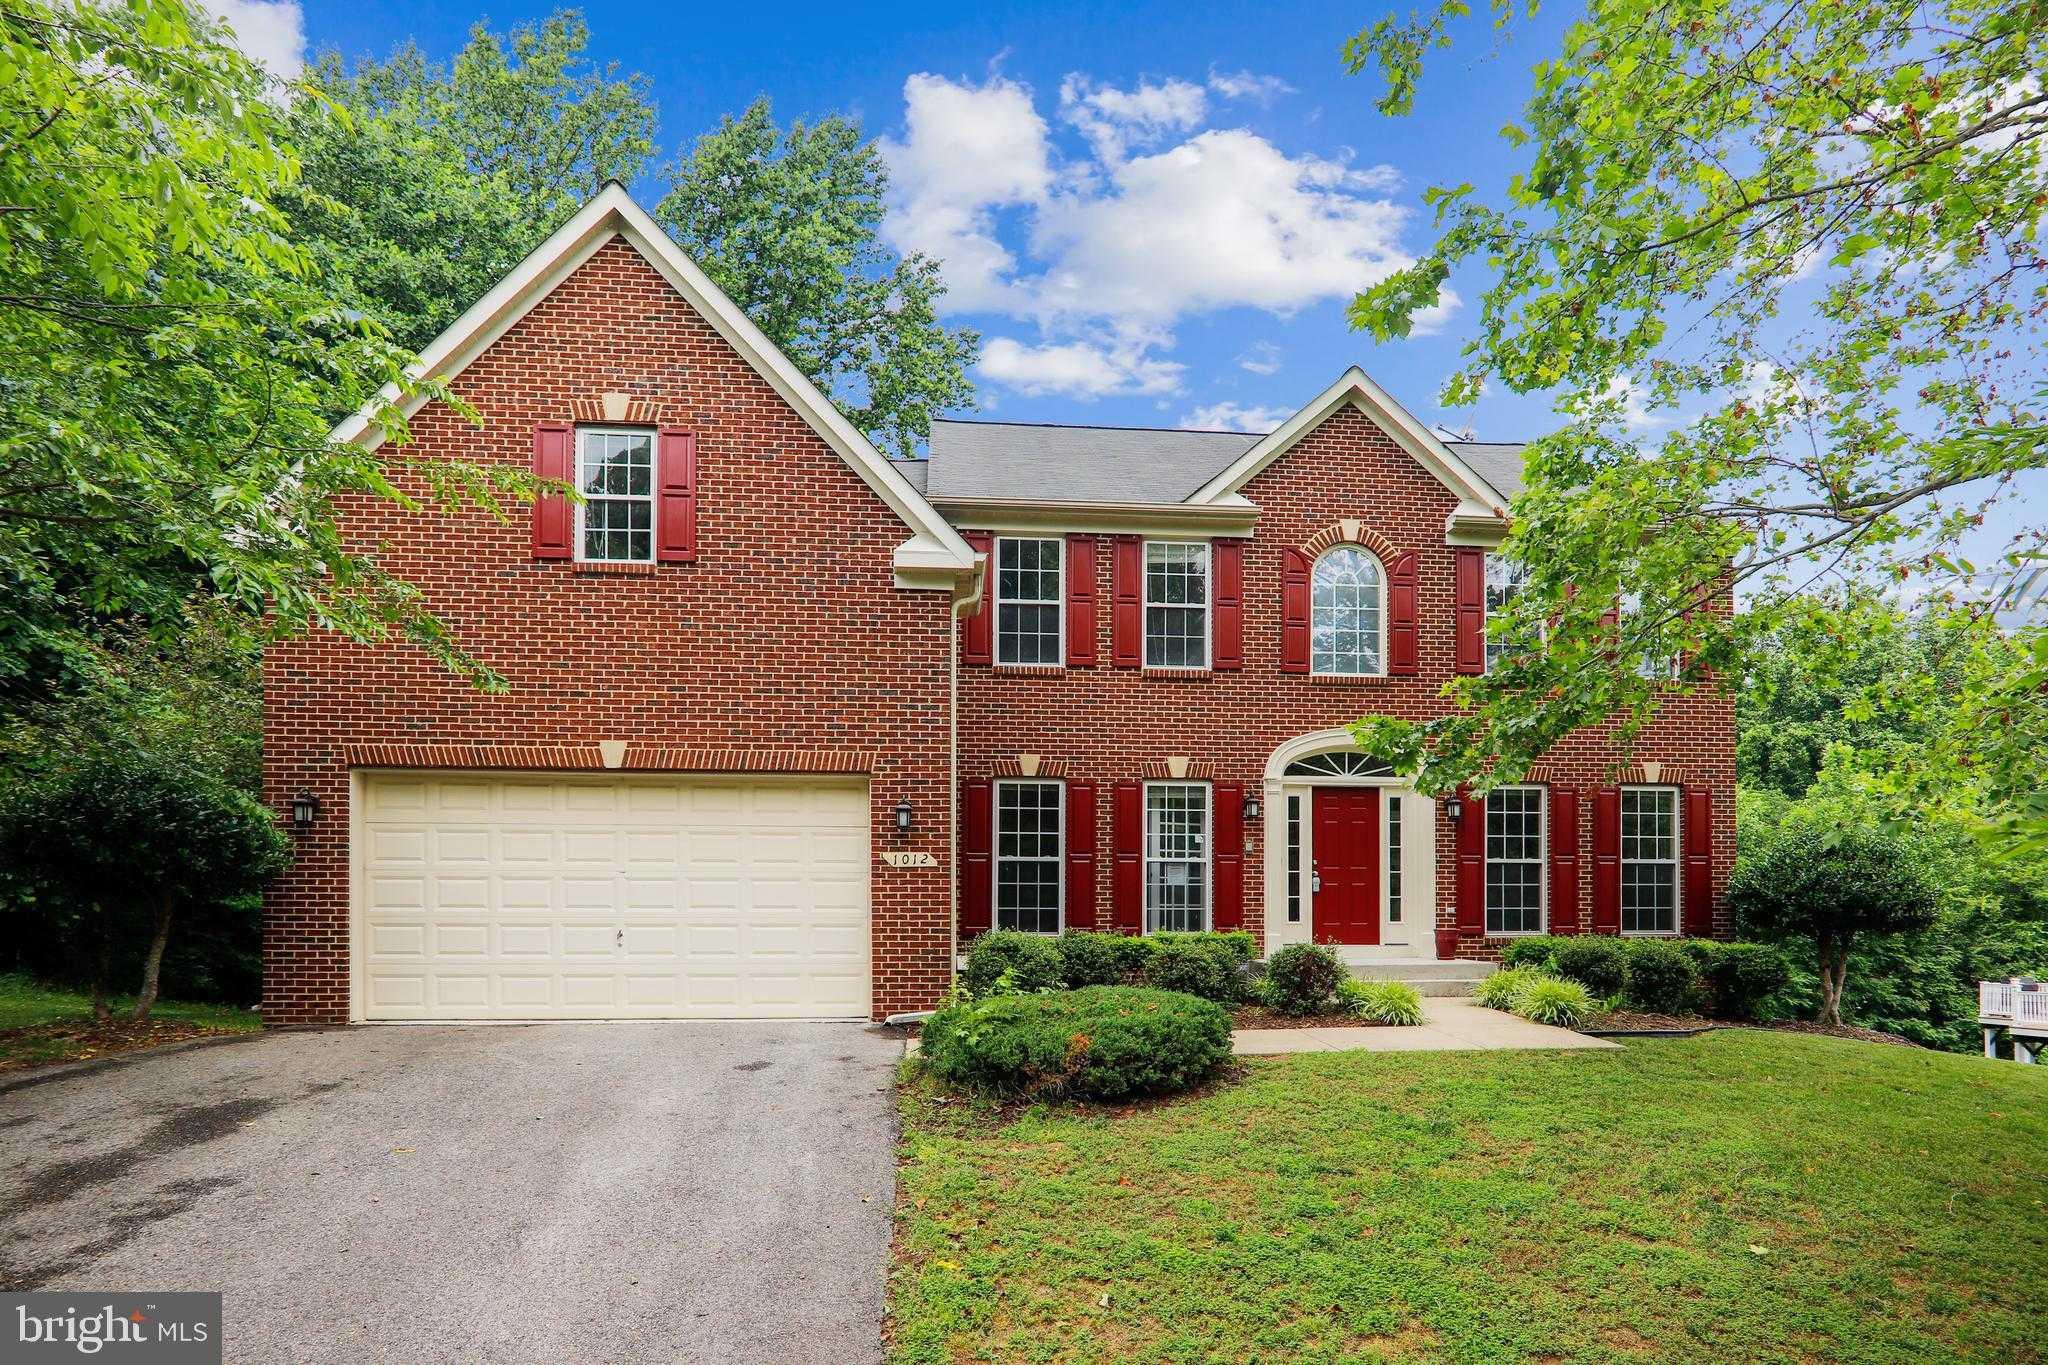 $494,900 - 4Br/4Ba -  for Sale in Horizon Hills, Accokeek